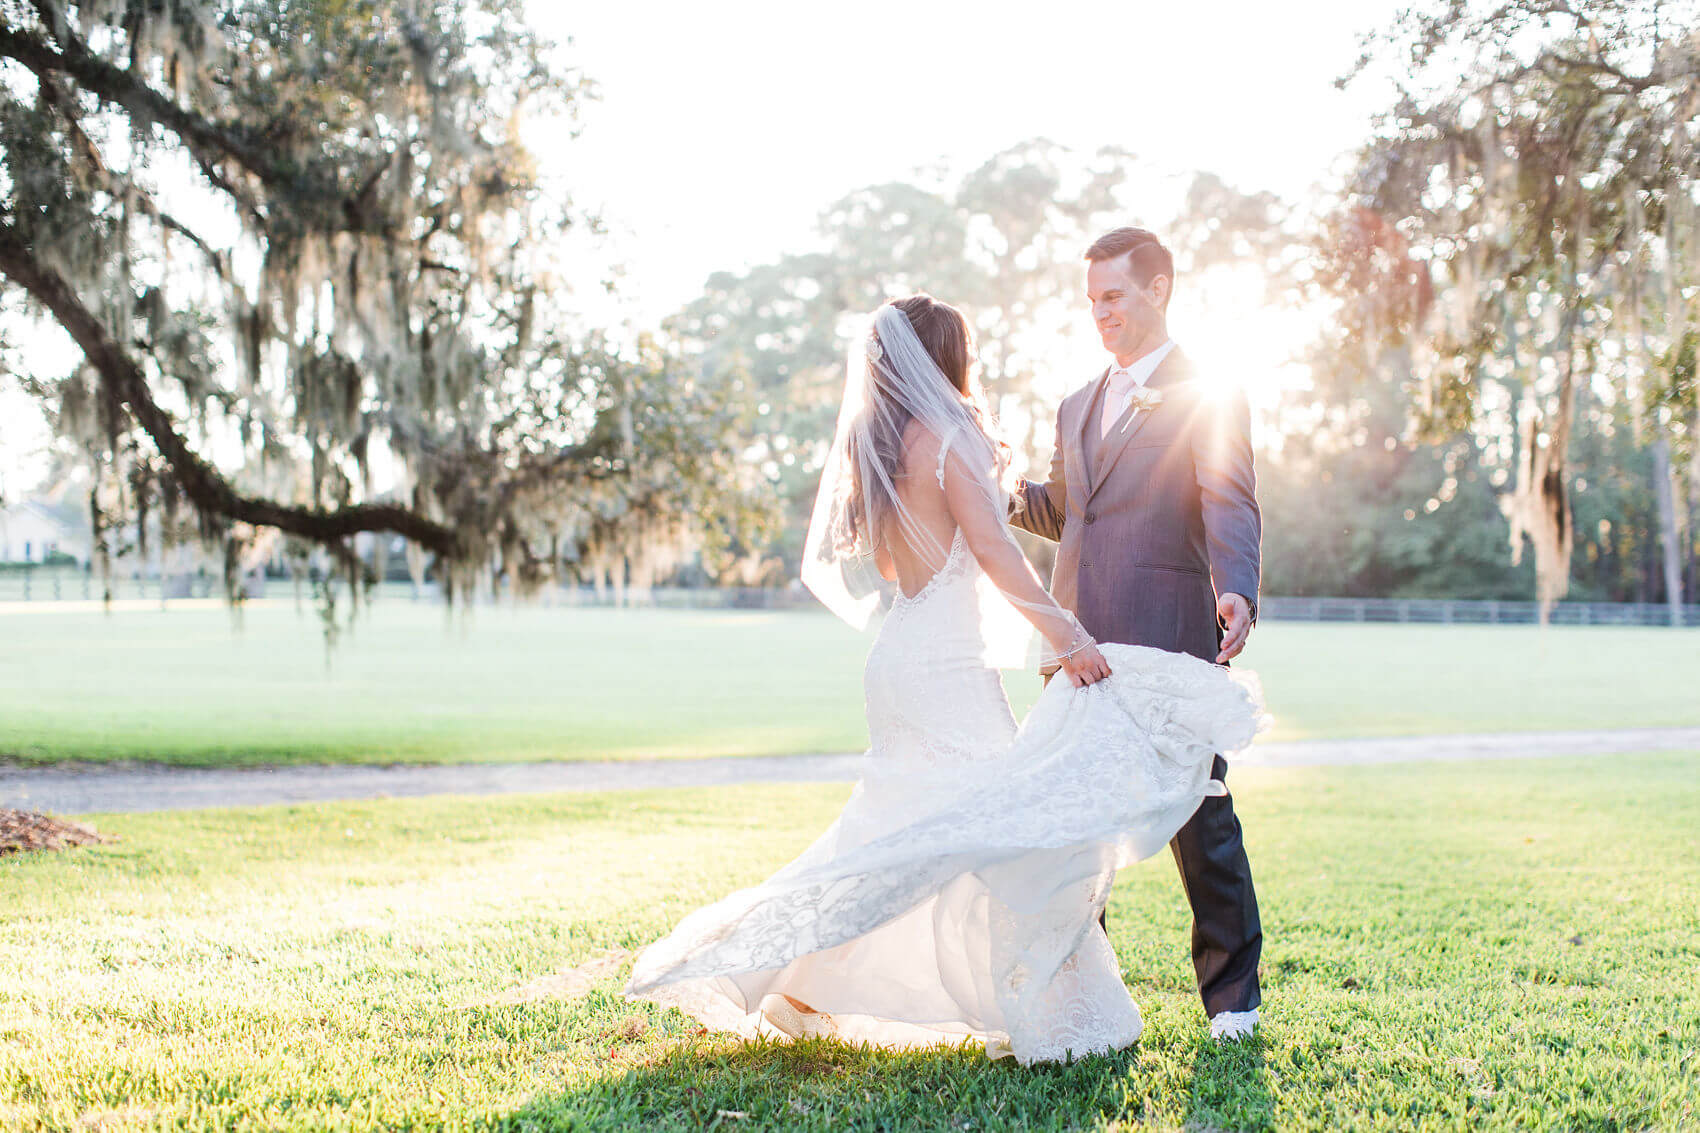 Apt-b-photography-savannah-wedding-photographer-savannah-wedding-hilton-head-wedding-photographer-17.jpg